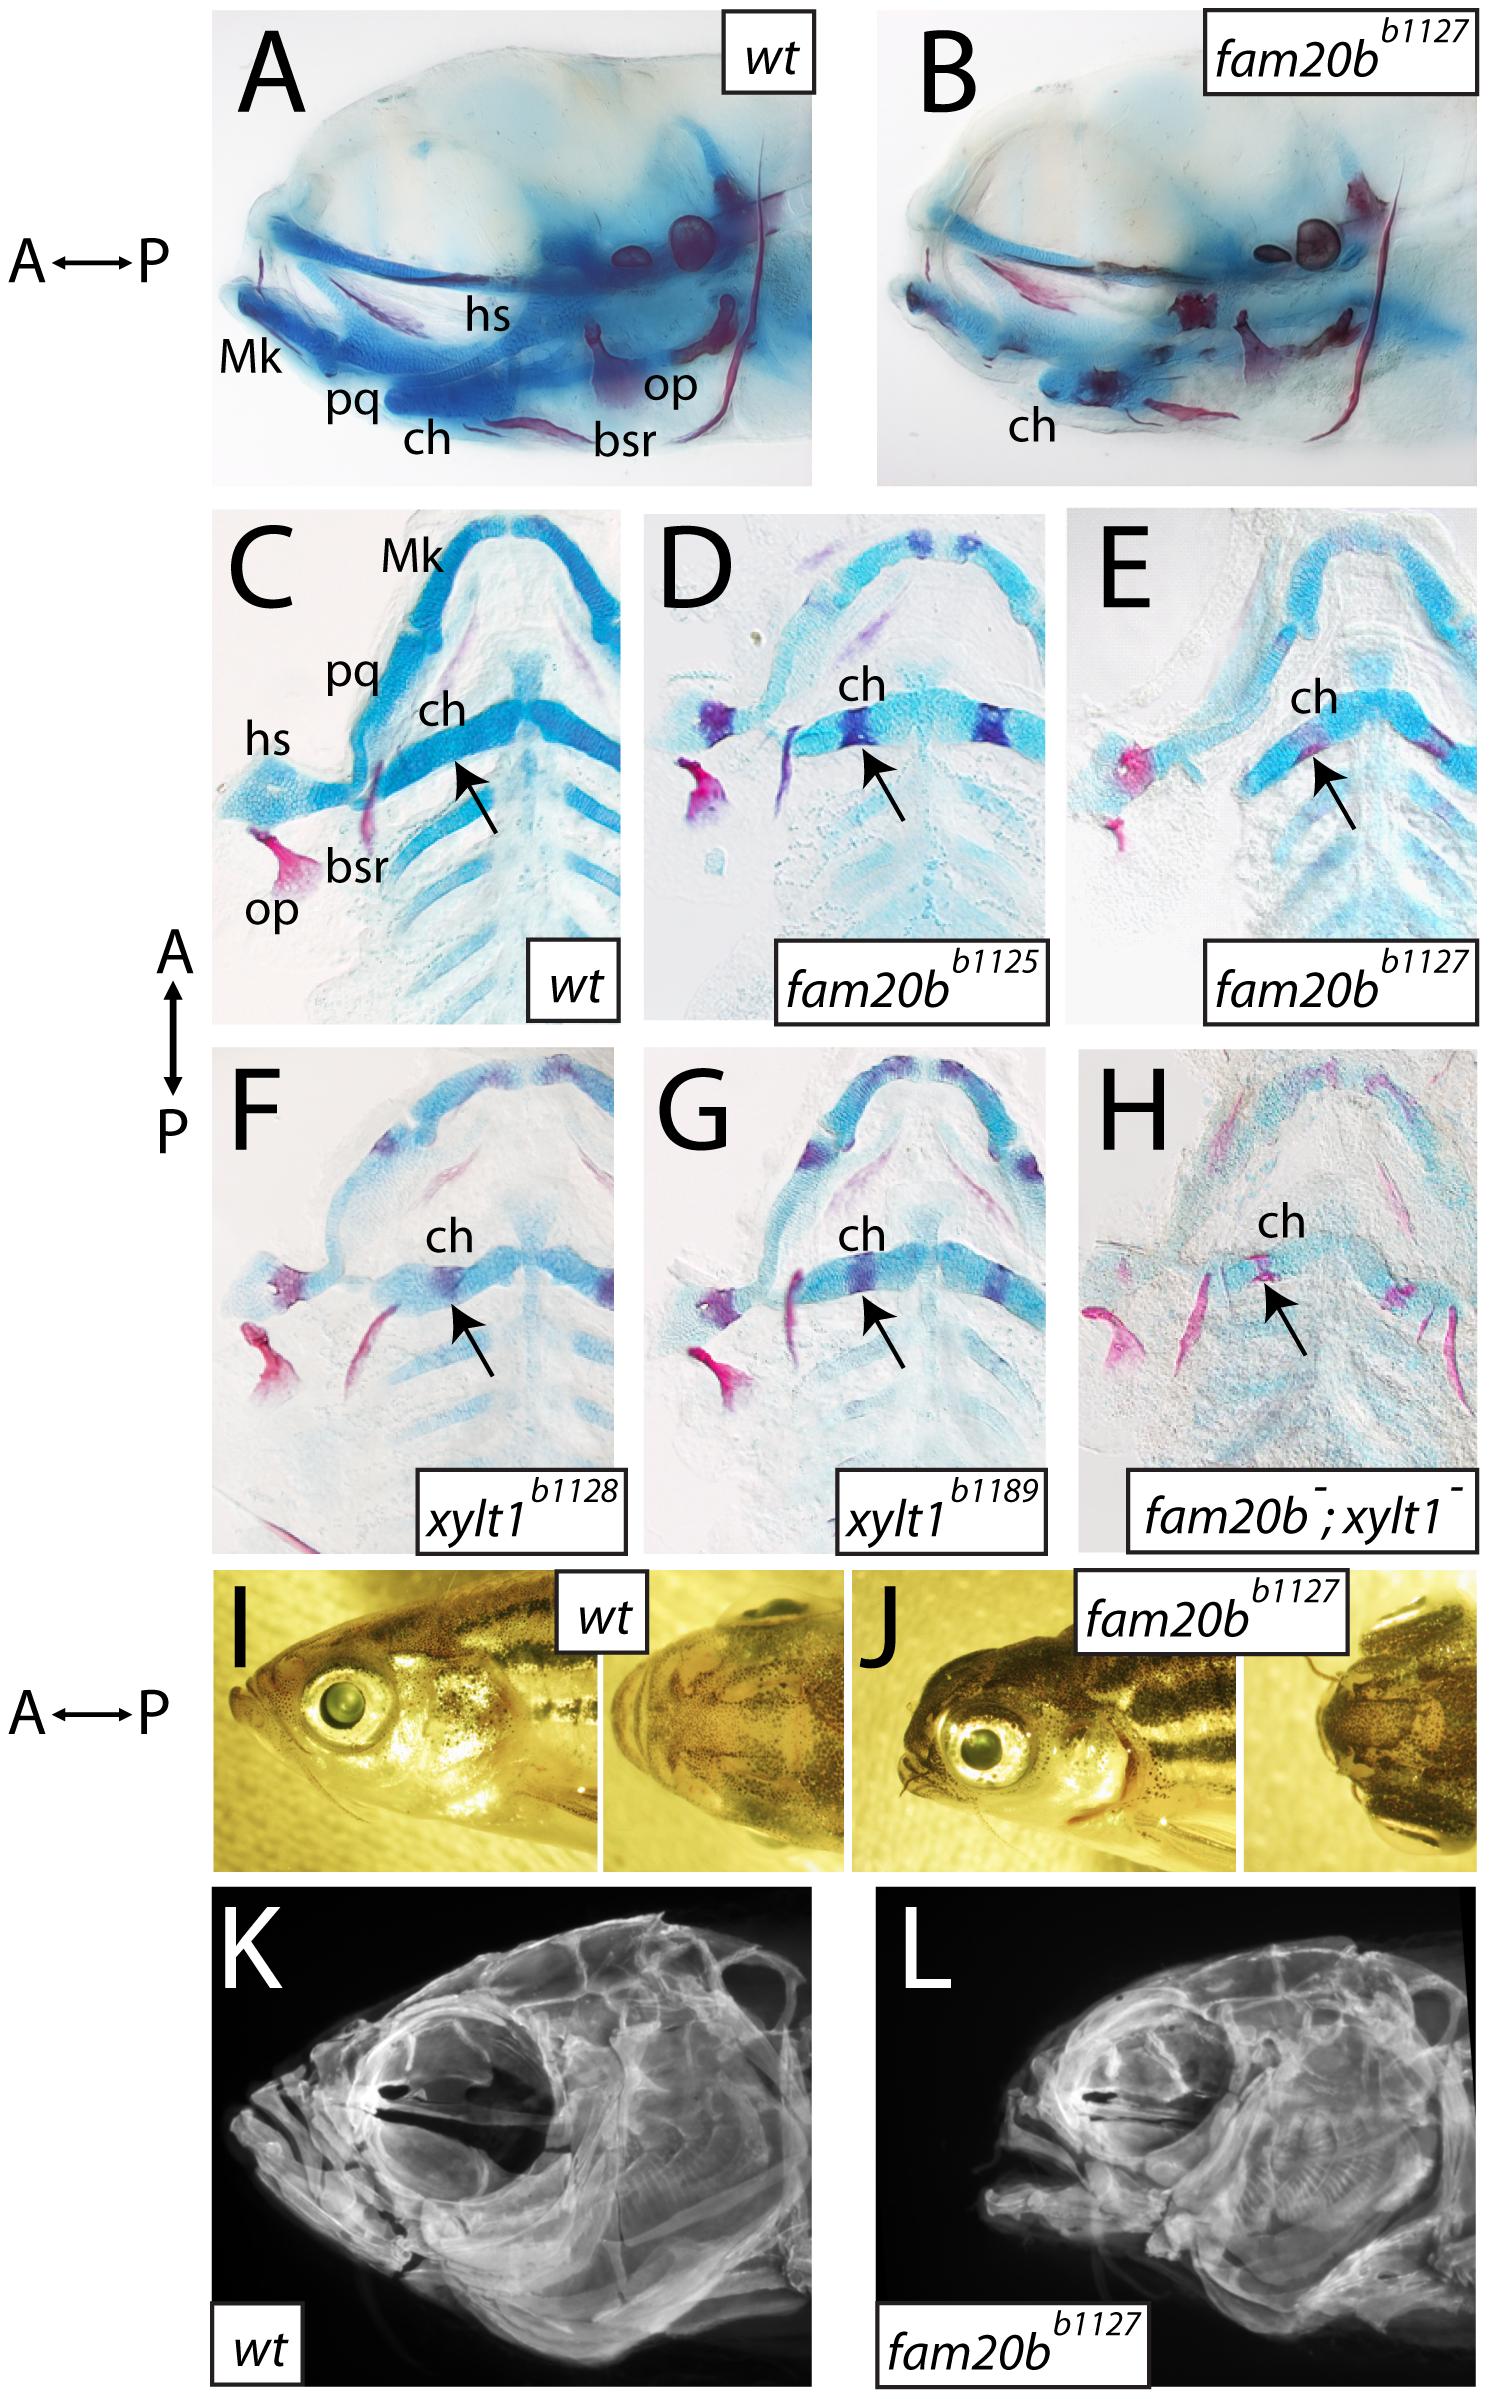 Craniofacial skeletons of mutant zebrafish larvae exhibit increased bone matrix and decreased cartilage matrix.